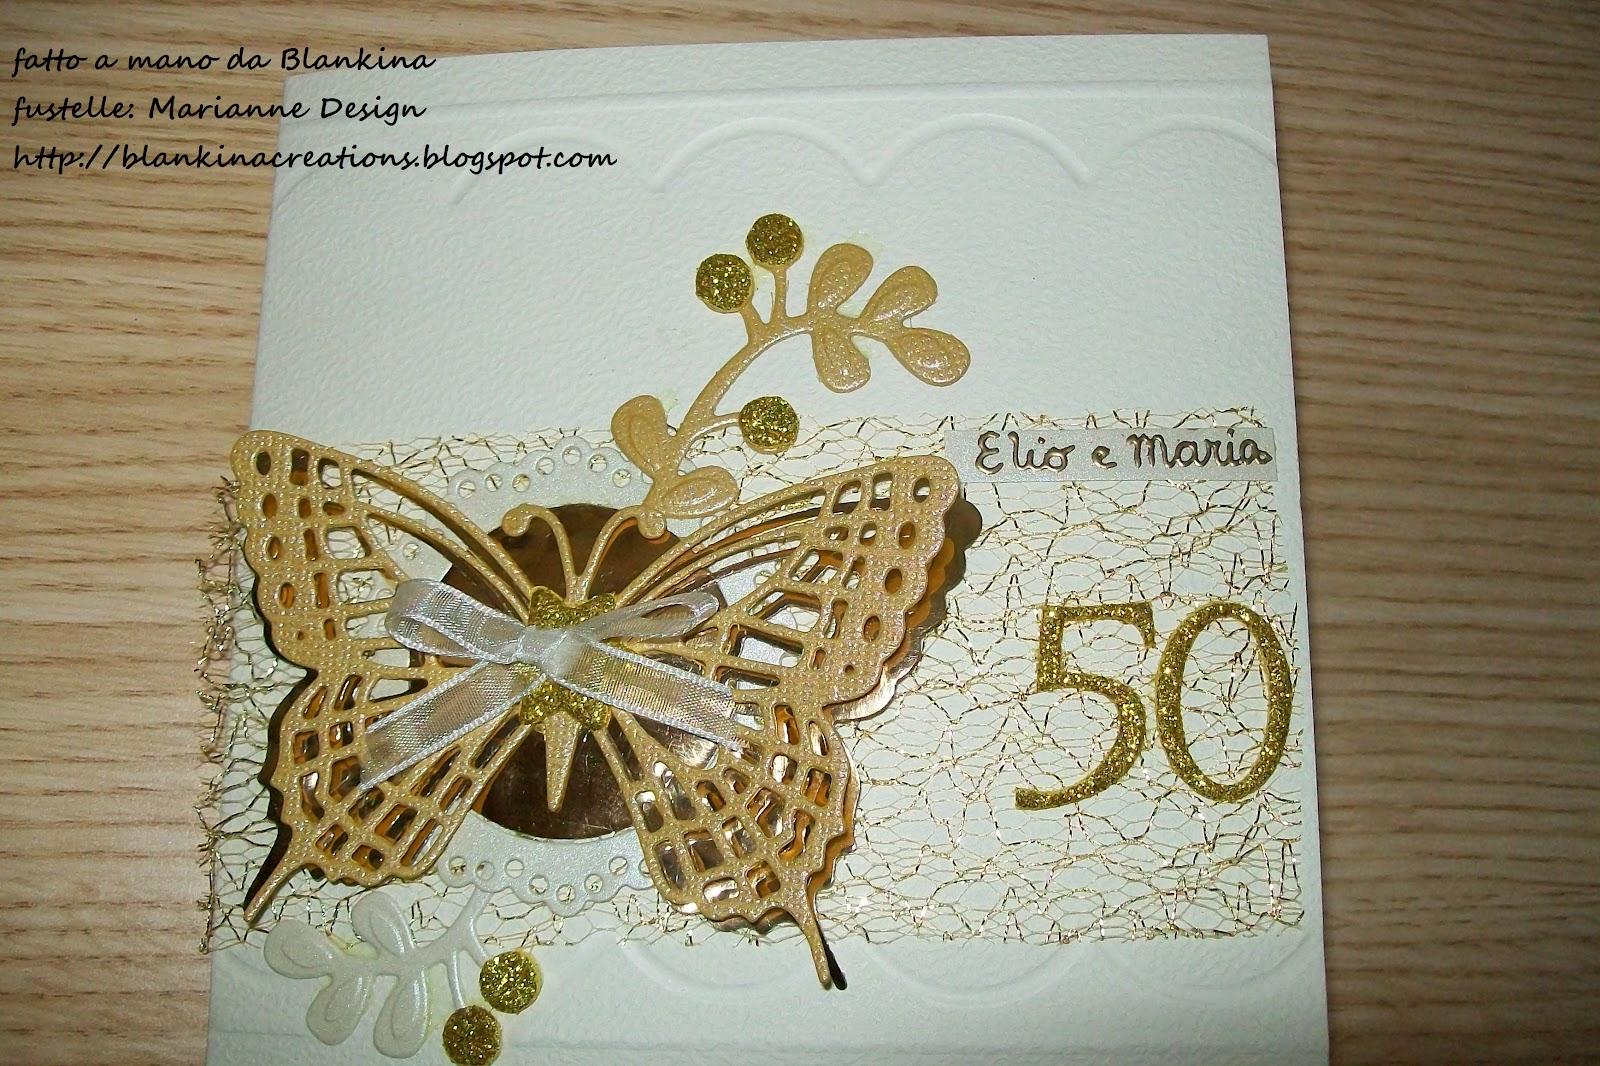 Anniversario Matrimonio Toscana : Blankina creations sketchalious sketch anniversario di